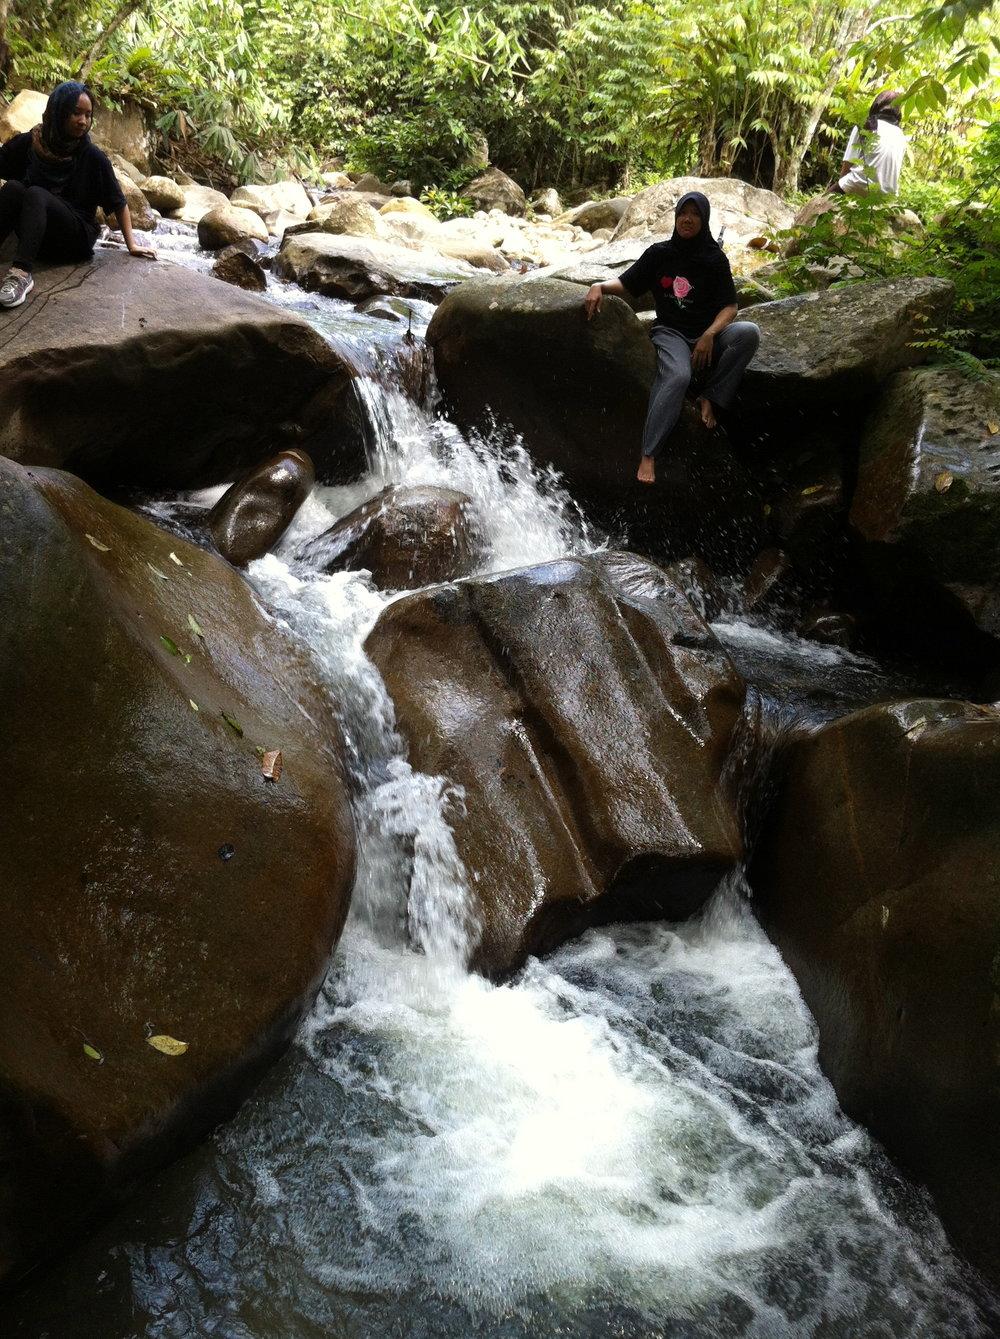 Small Waterfalls at Chemperoh River – 35 mins walk away